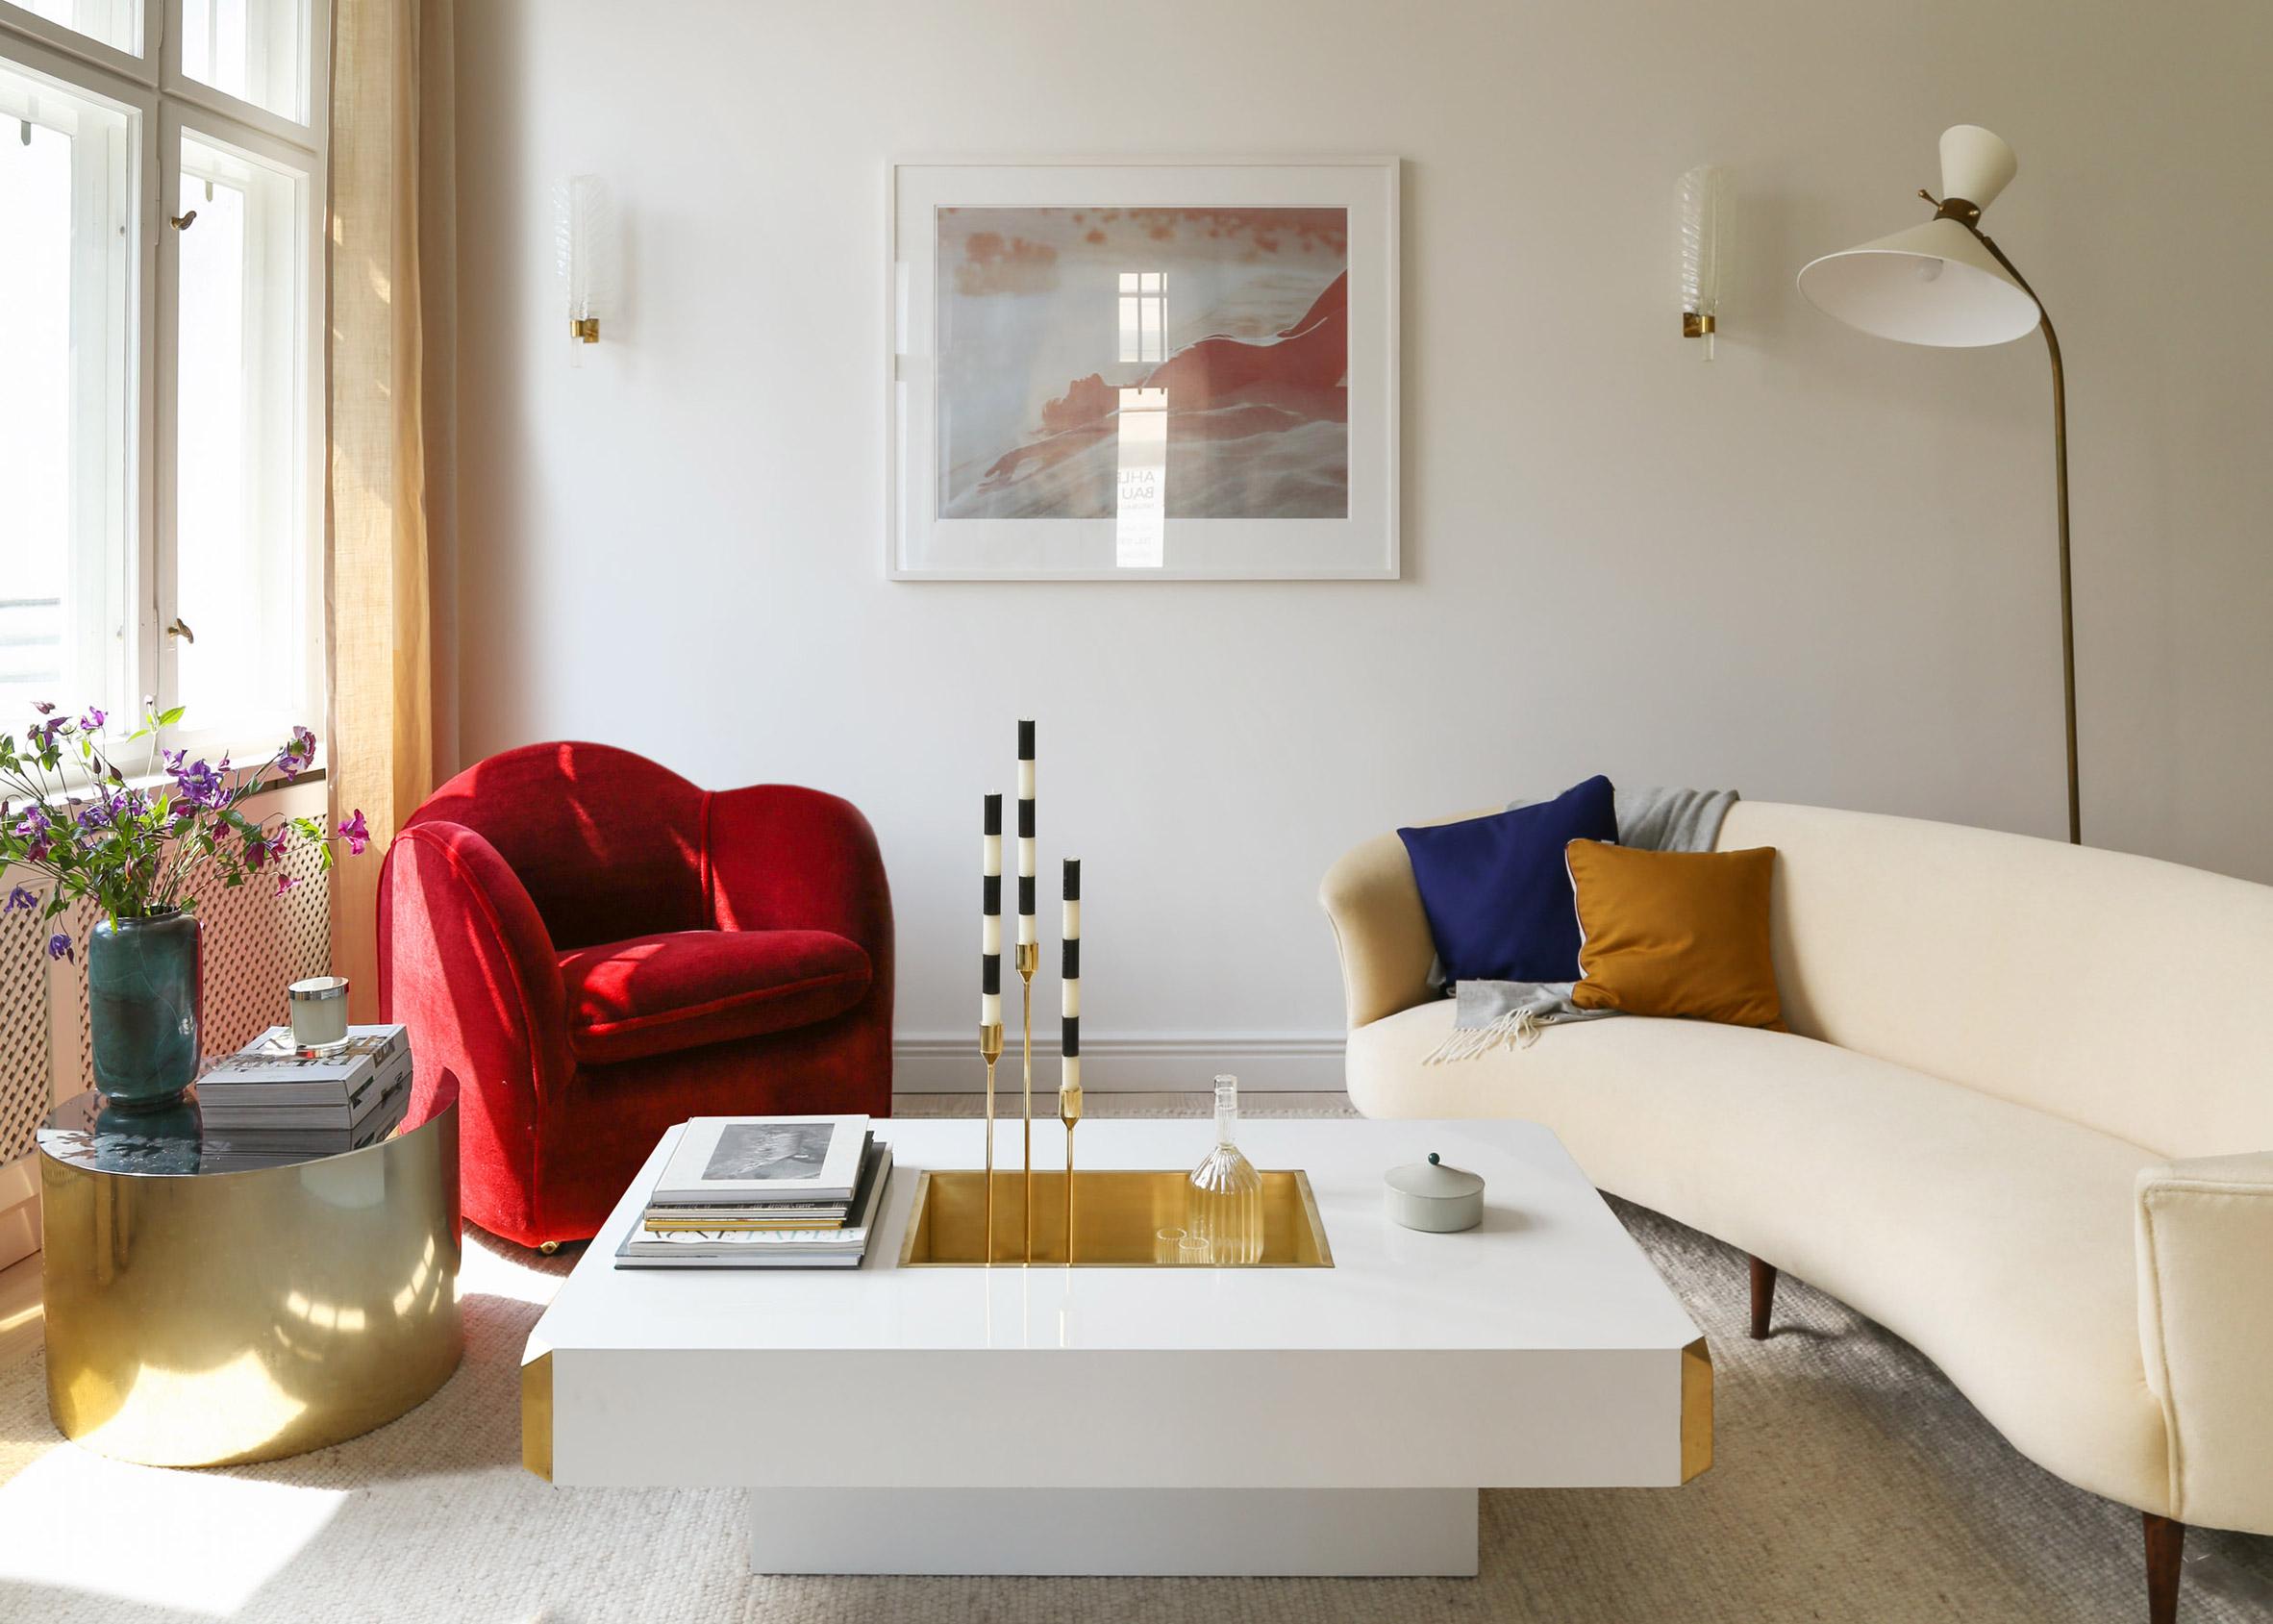 Glogauer Apartment by White Arrow